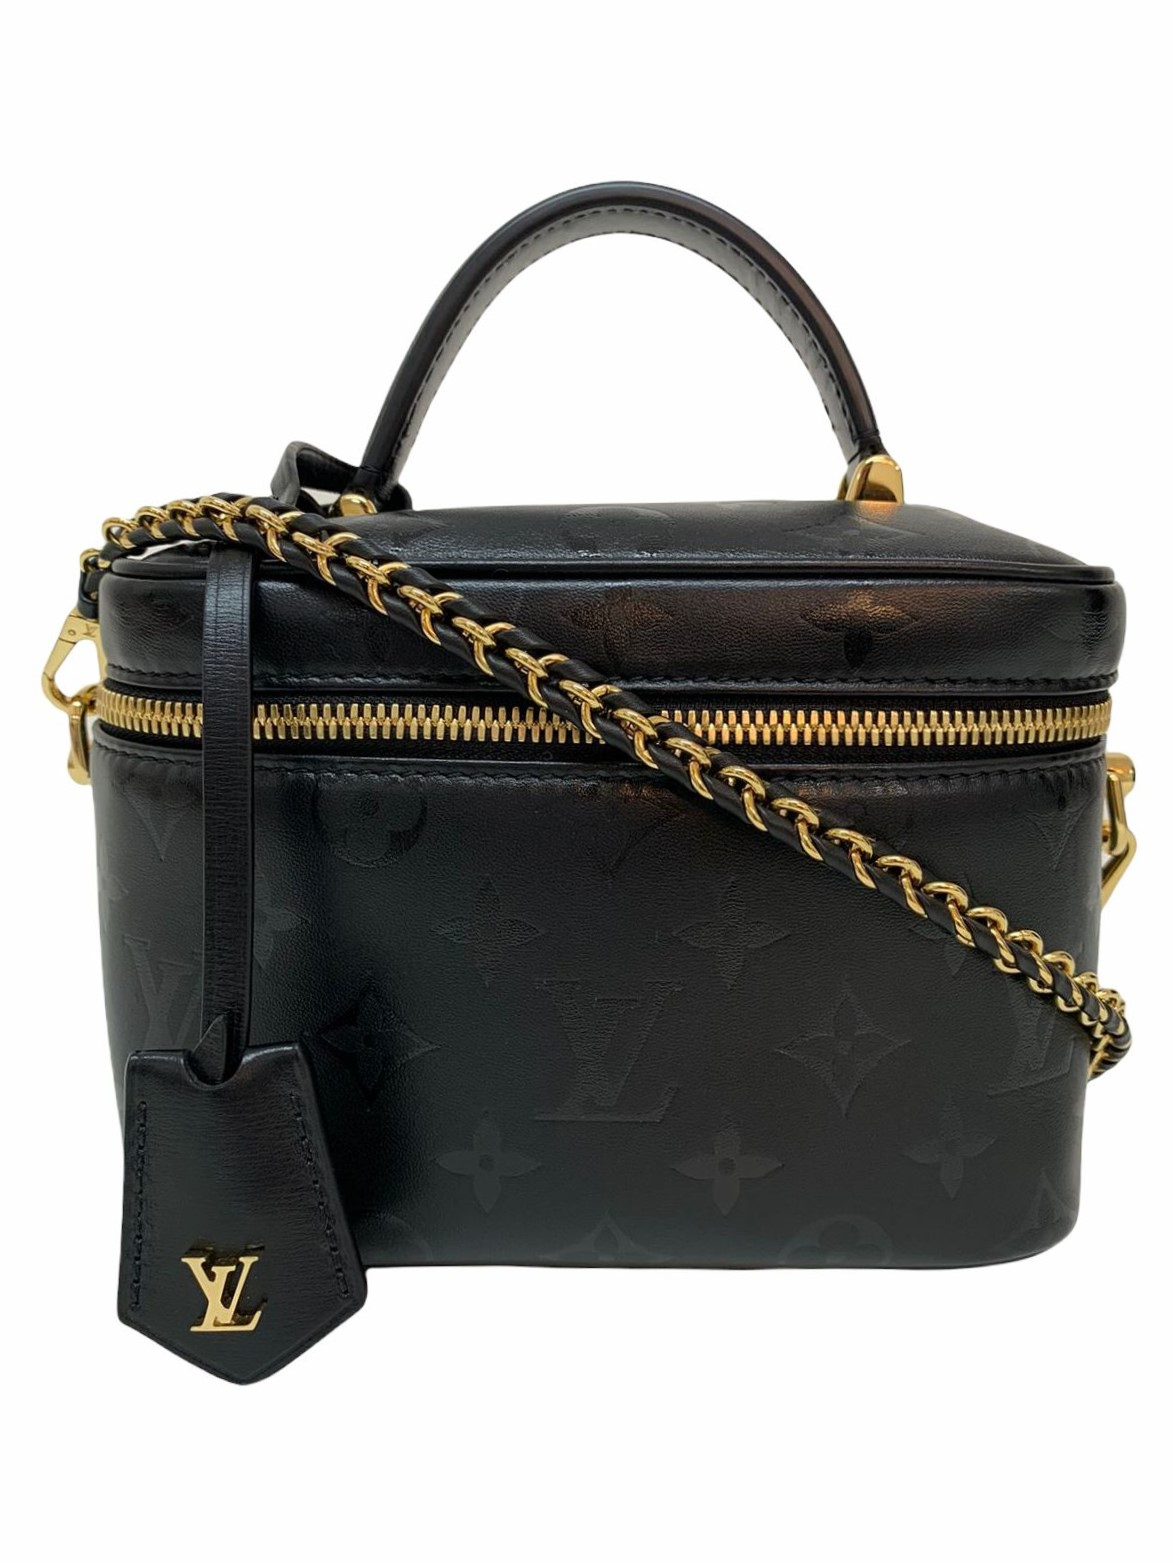 Bolsa Louis Vuitton Vanity PM